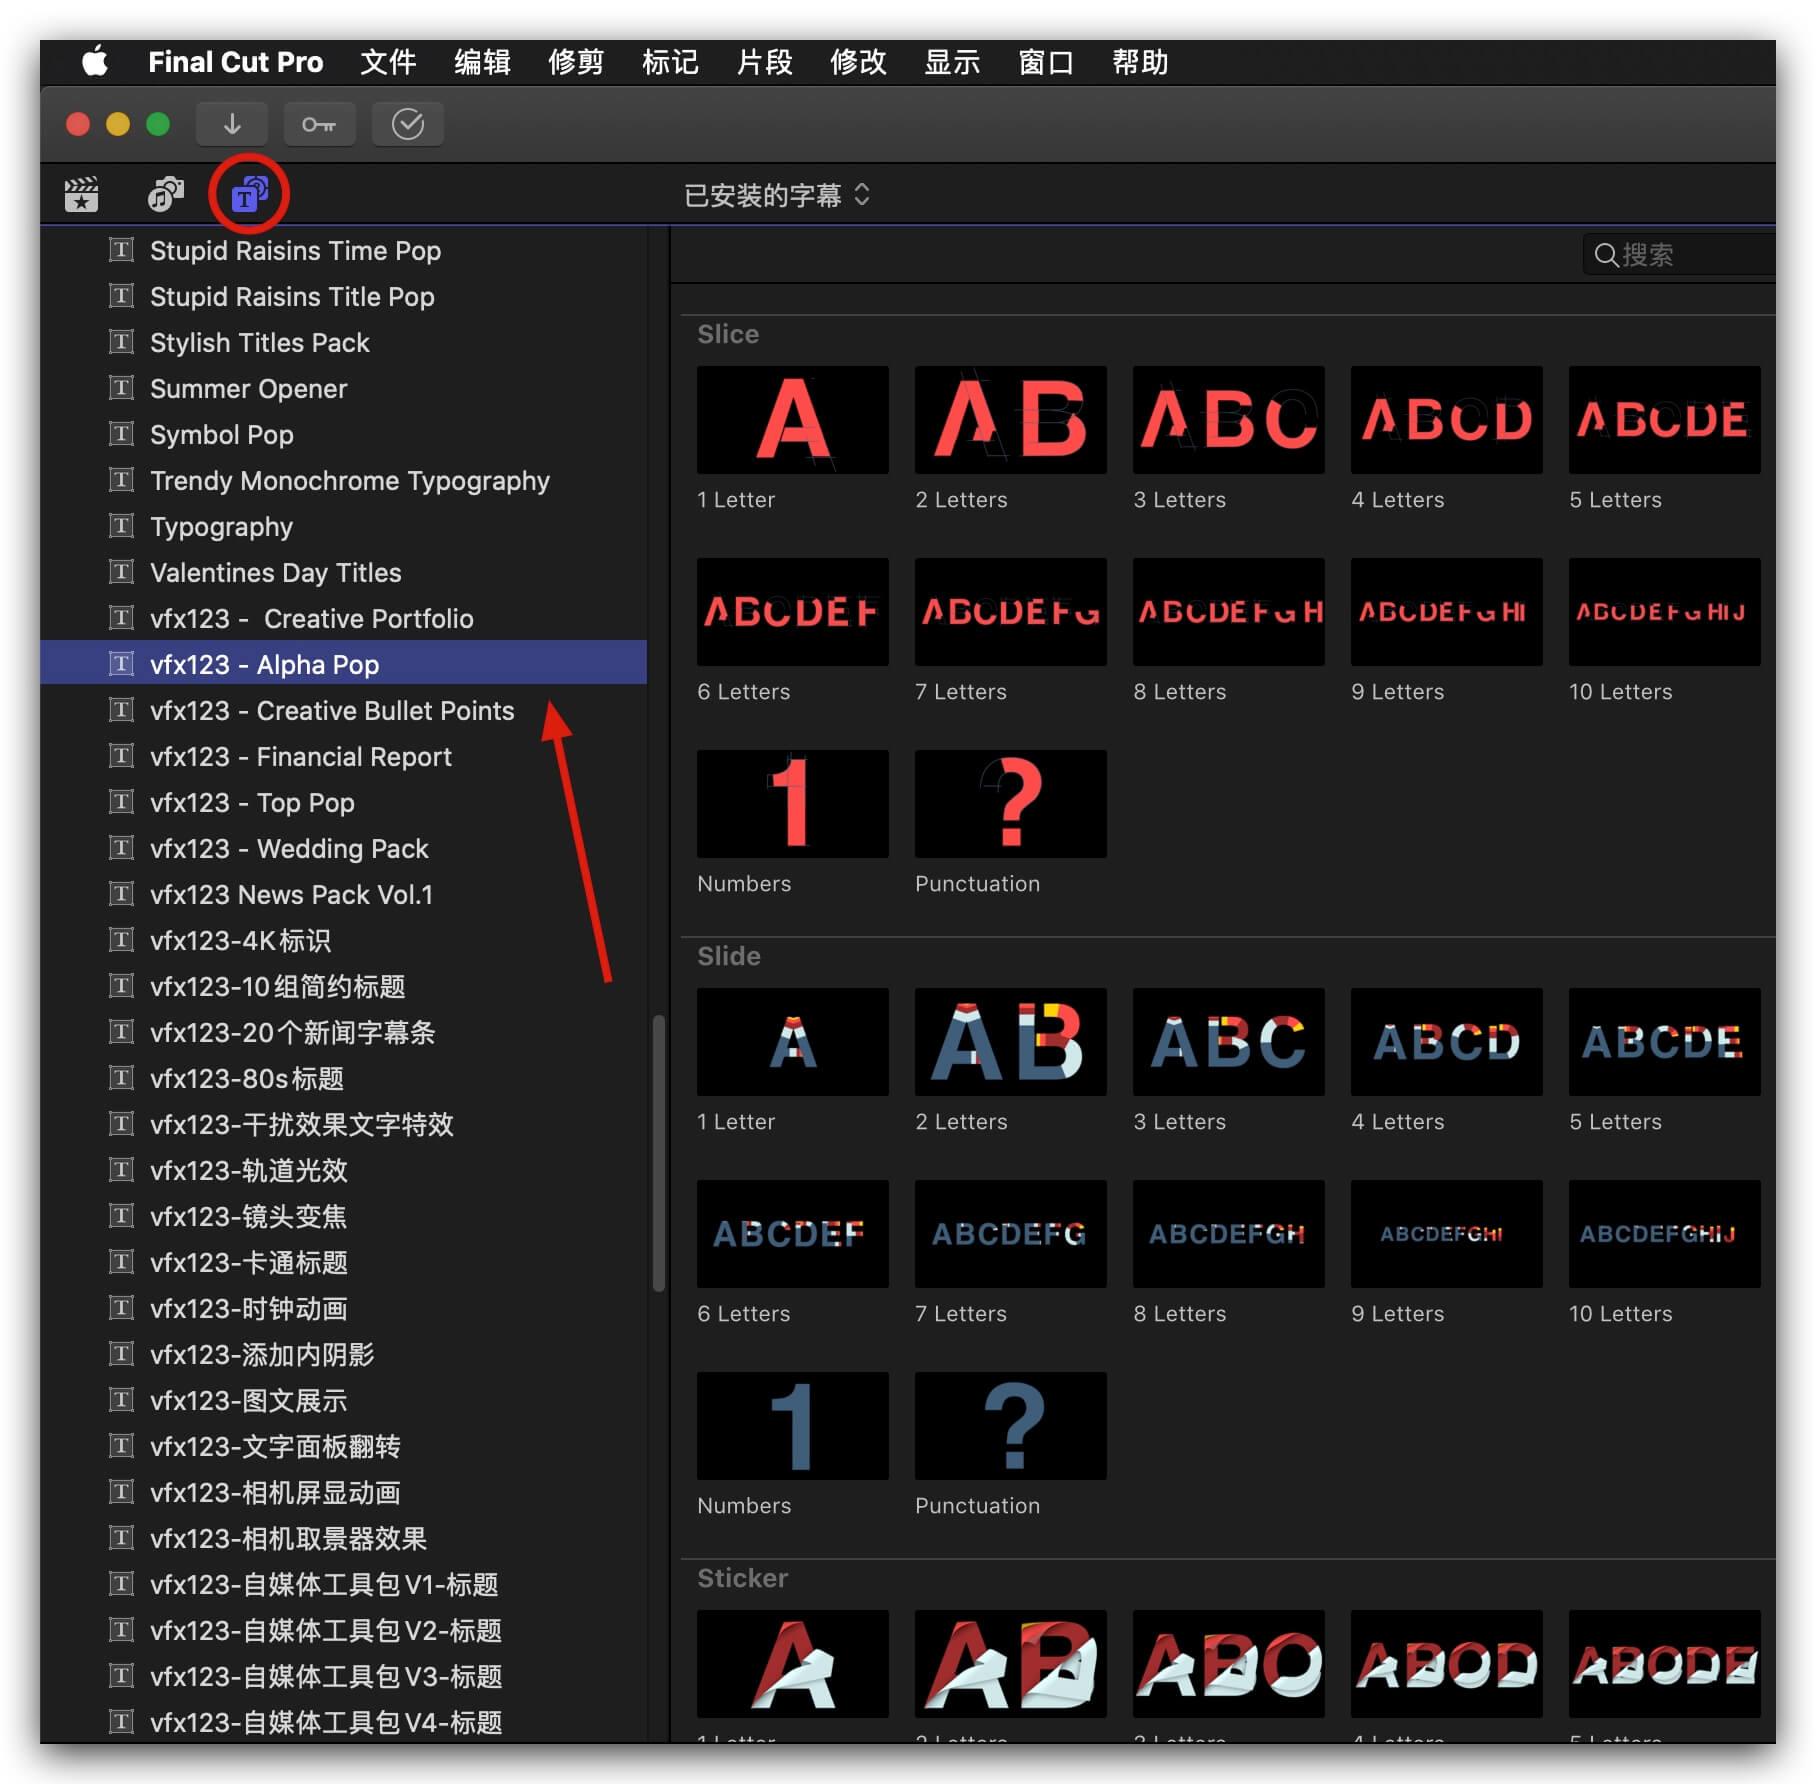 fcpx插件 手绘渐变描绘英文数字标点符号动画预设 Alpha Pop